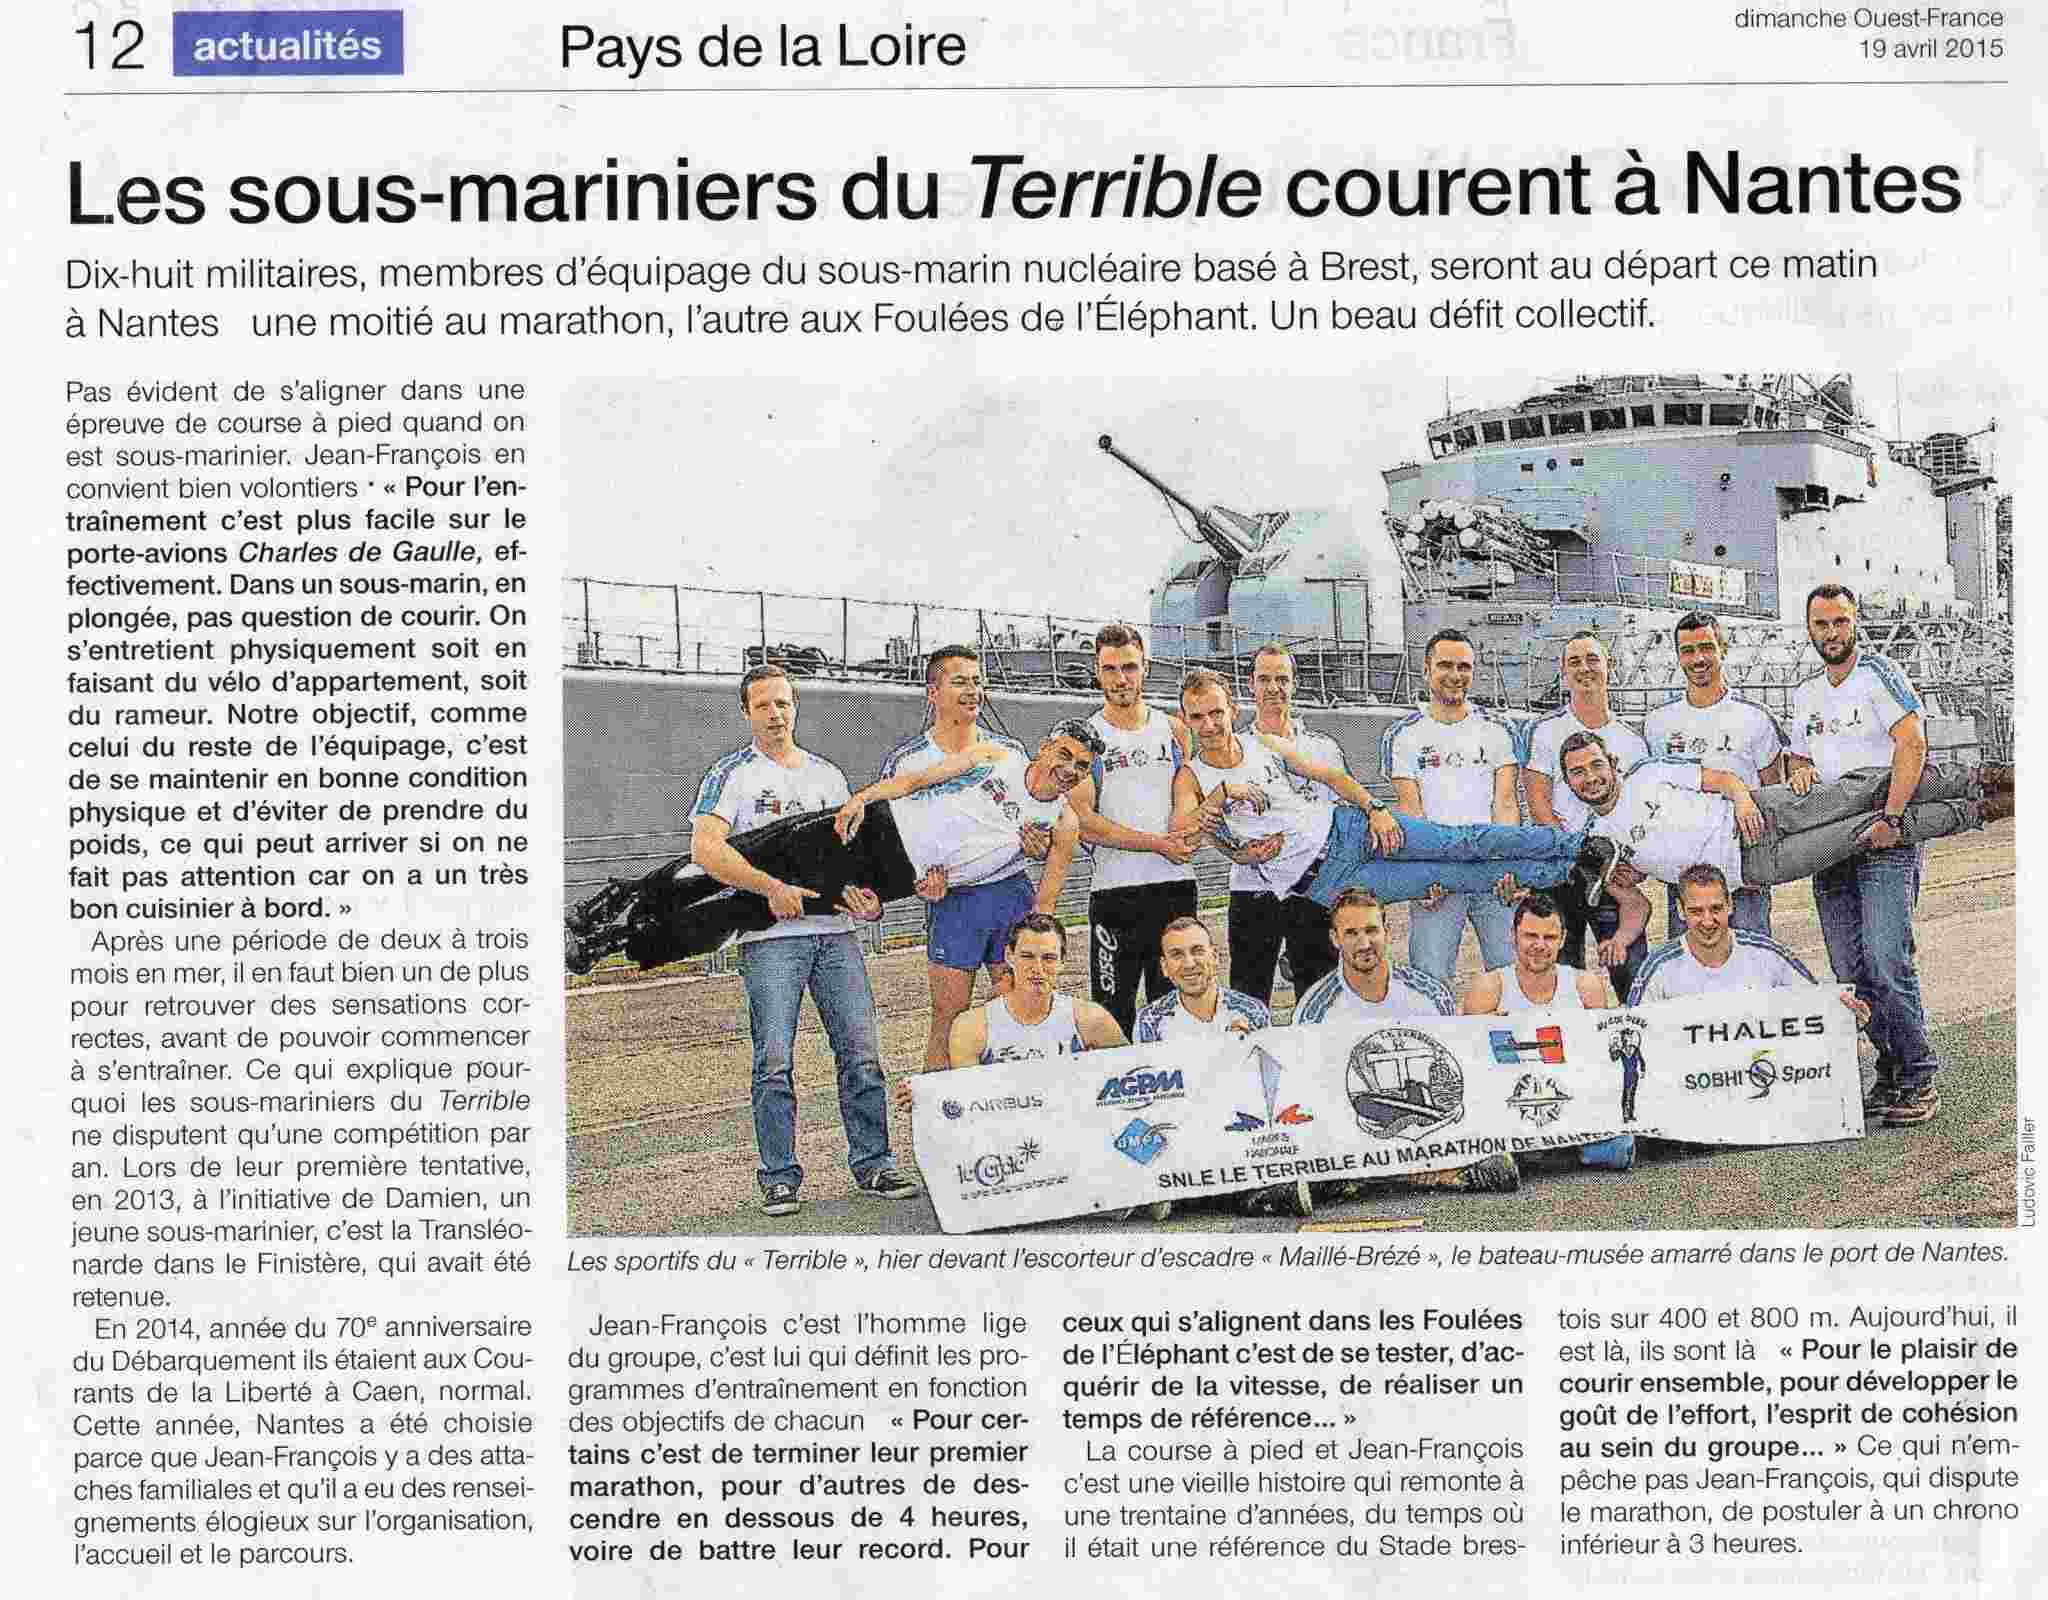 LE TERRIBLE (SNLE) - Page 5 Les_so10